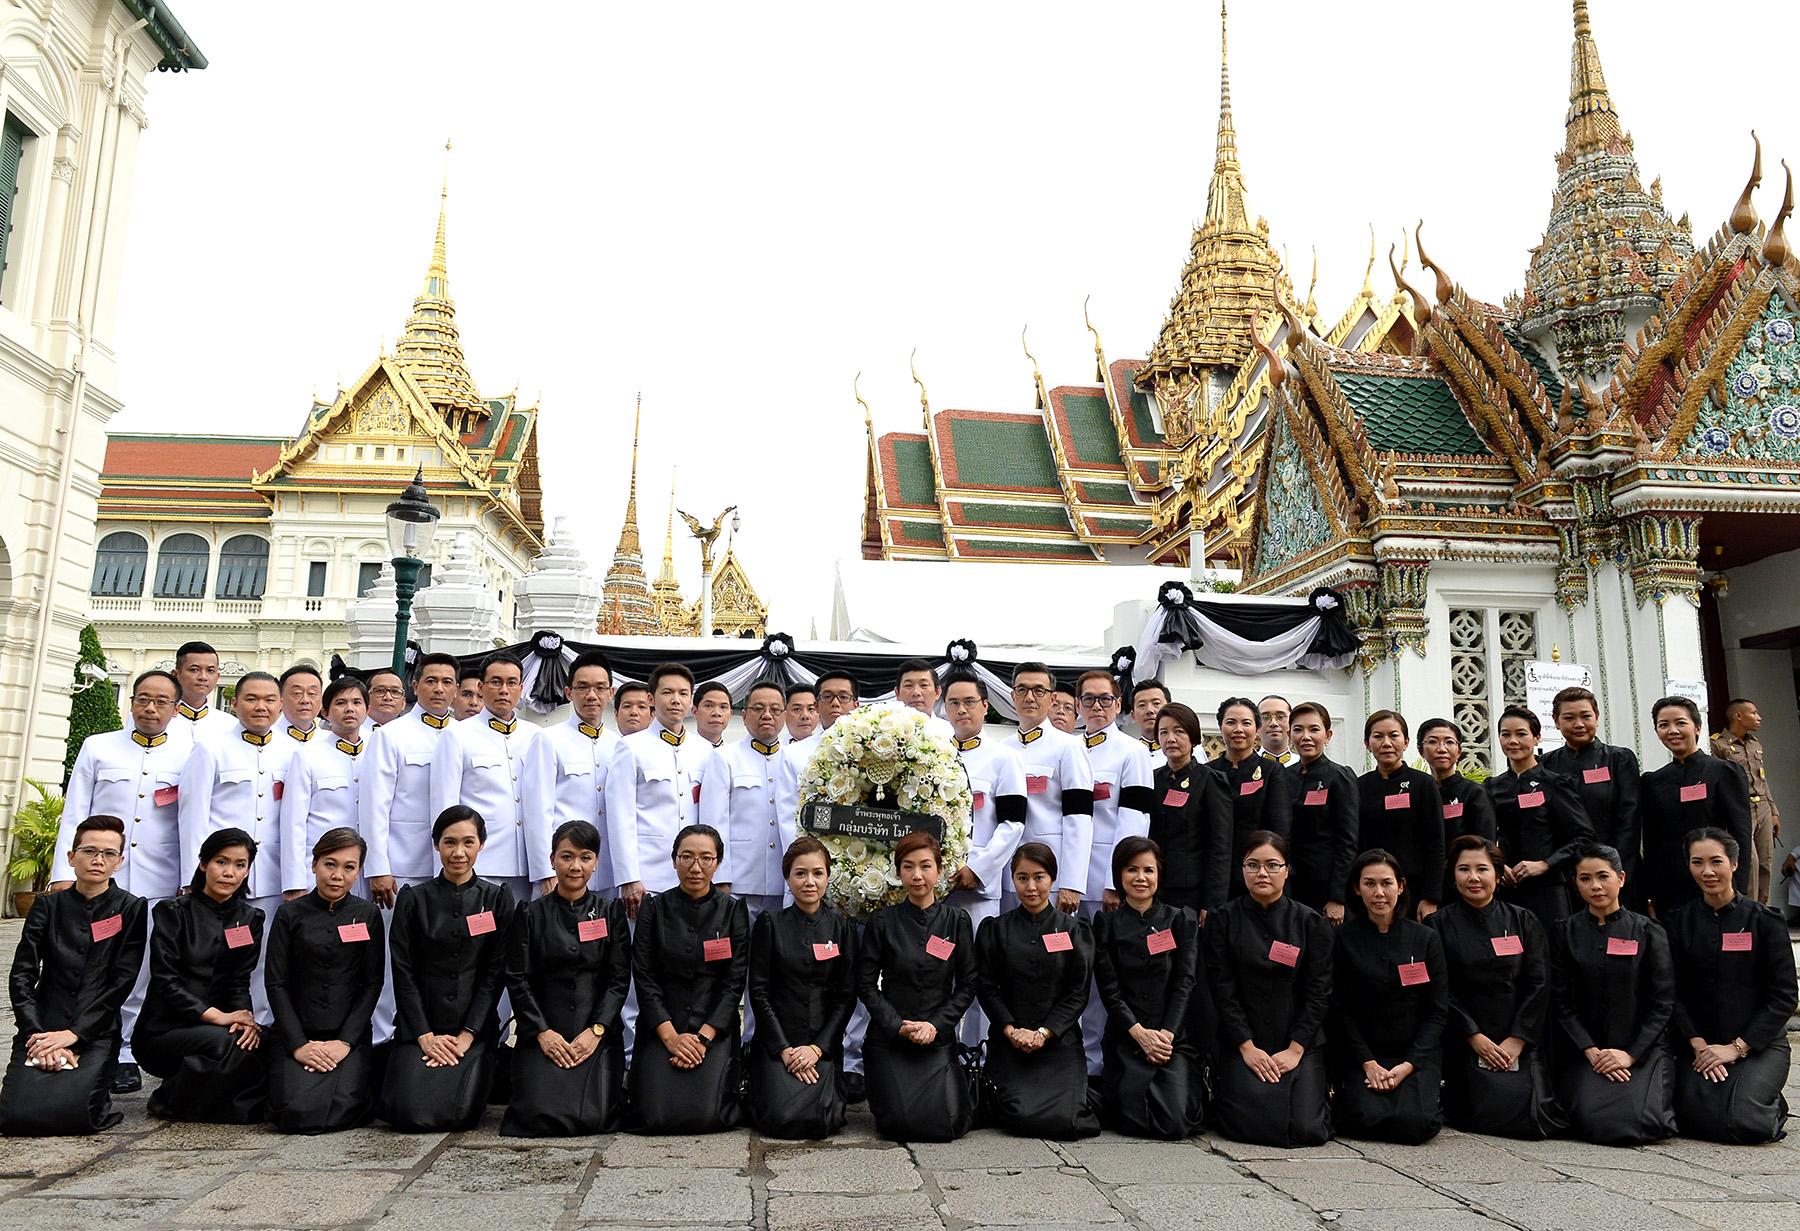 Mono Group sent condolence over the death of King Bhumibol Adulyadej